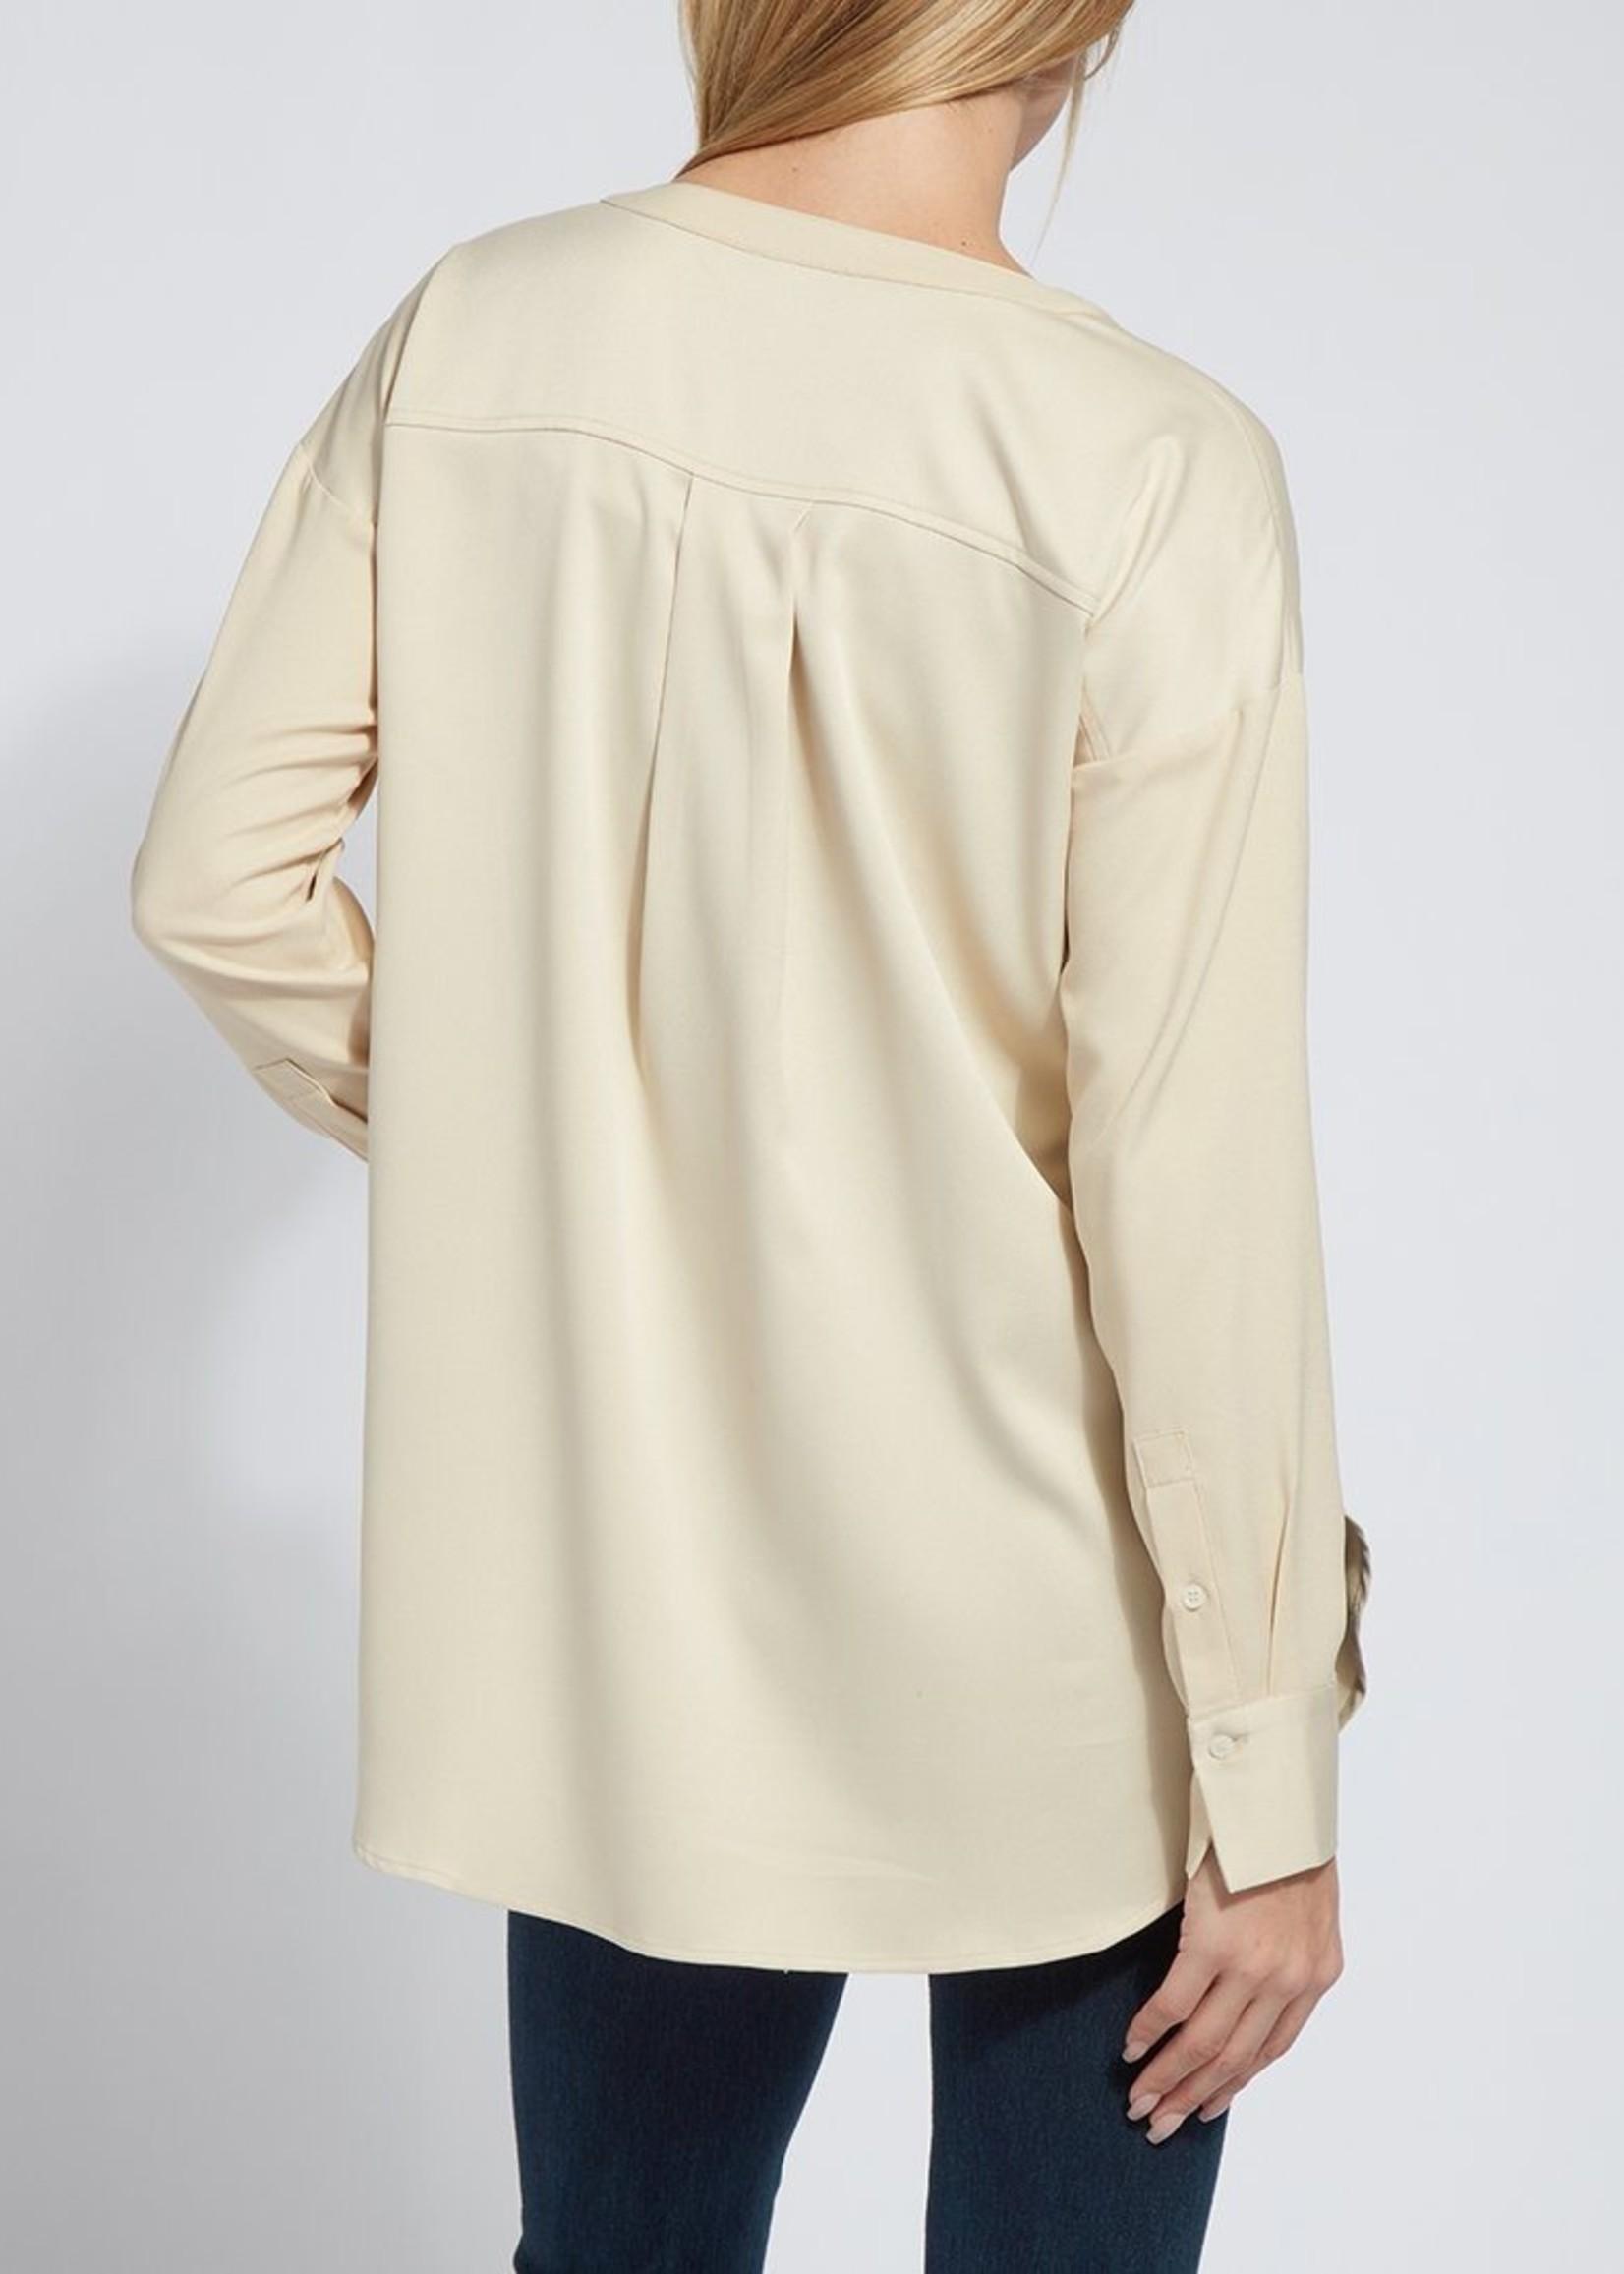 Lyssé Token Pullover Top